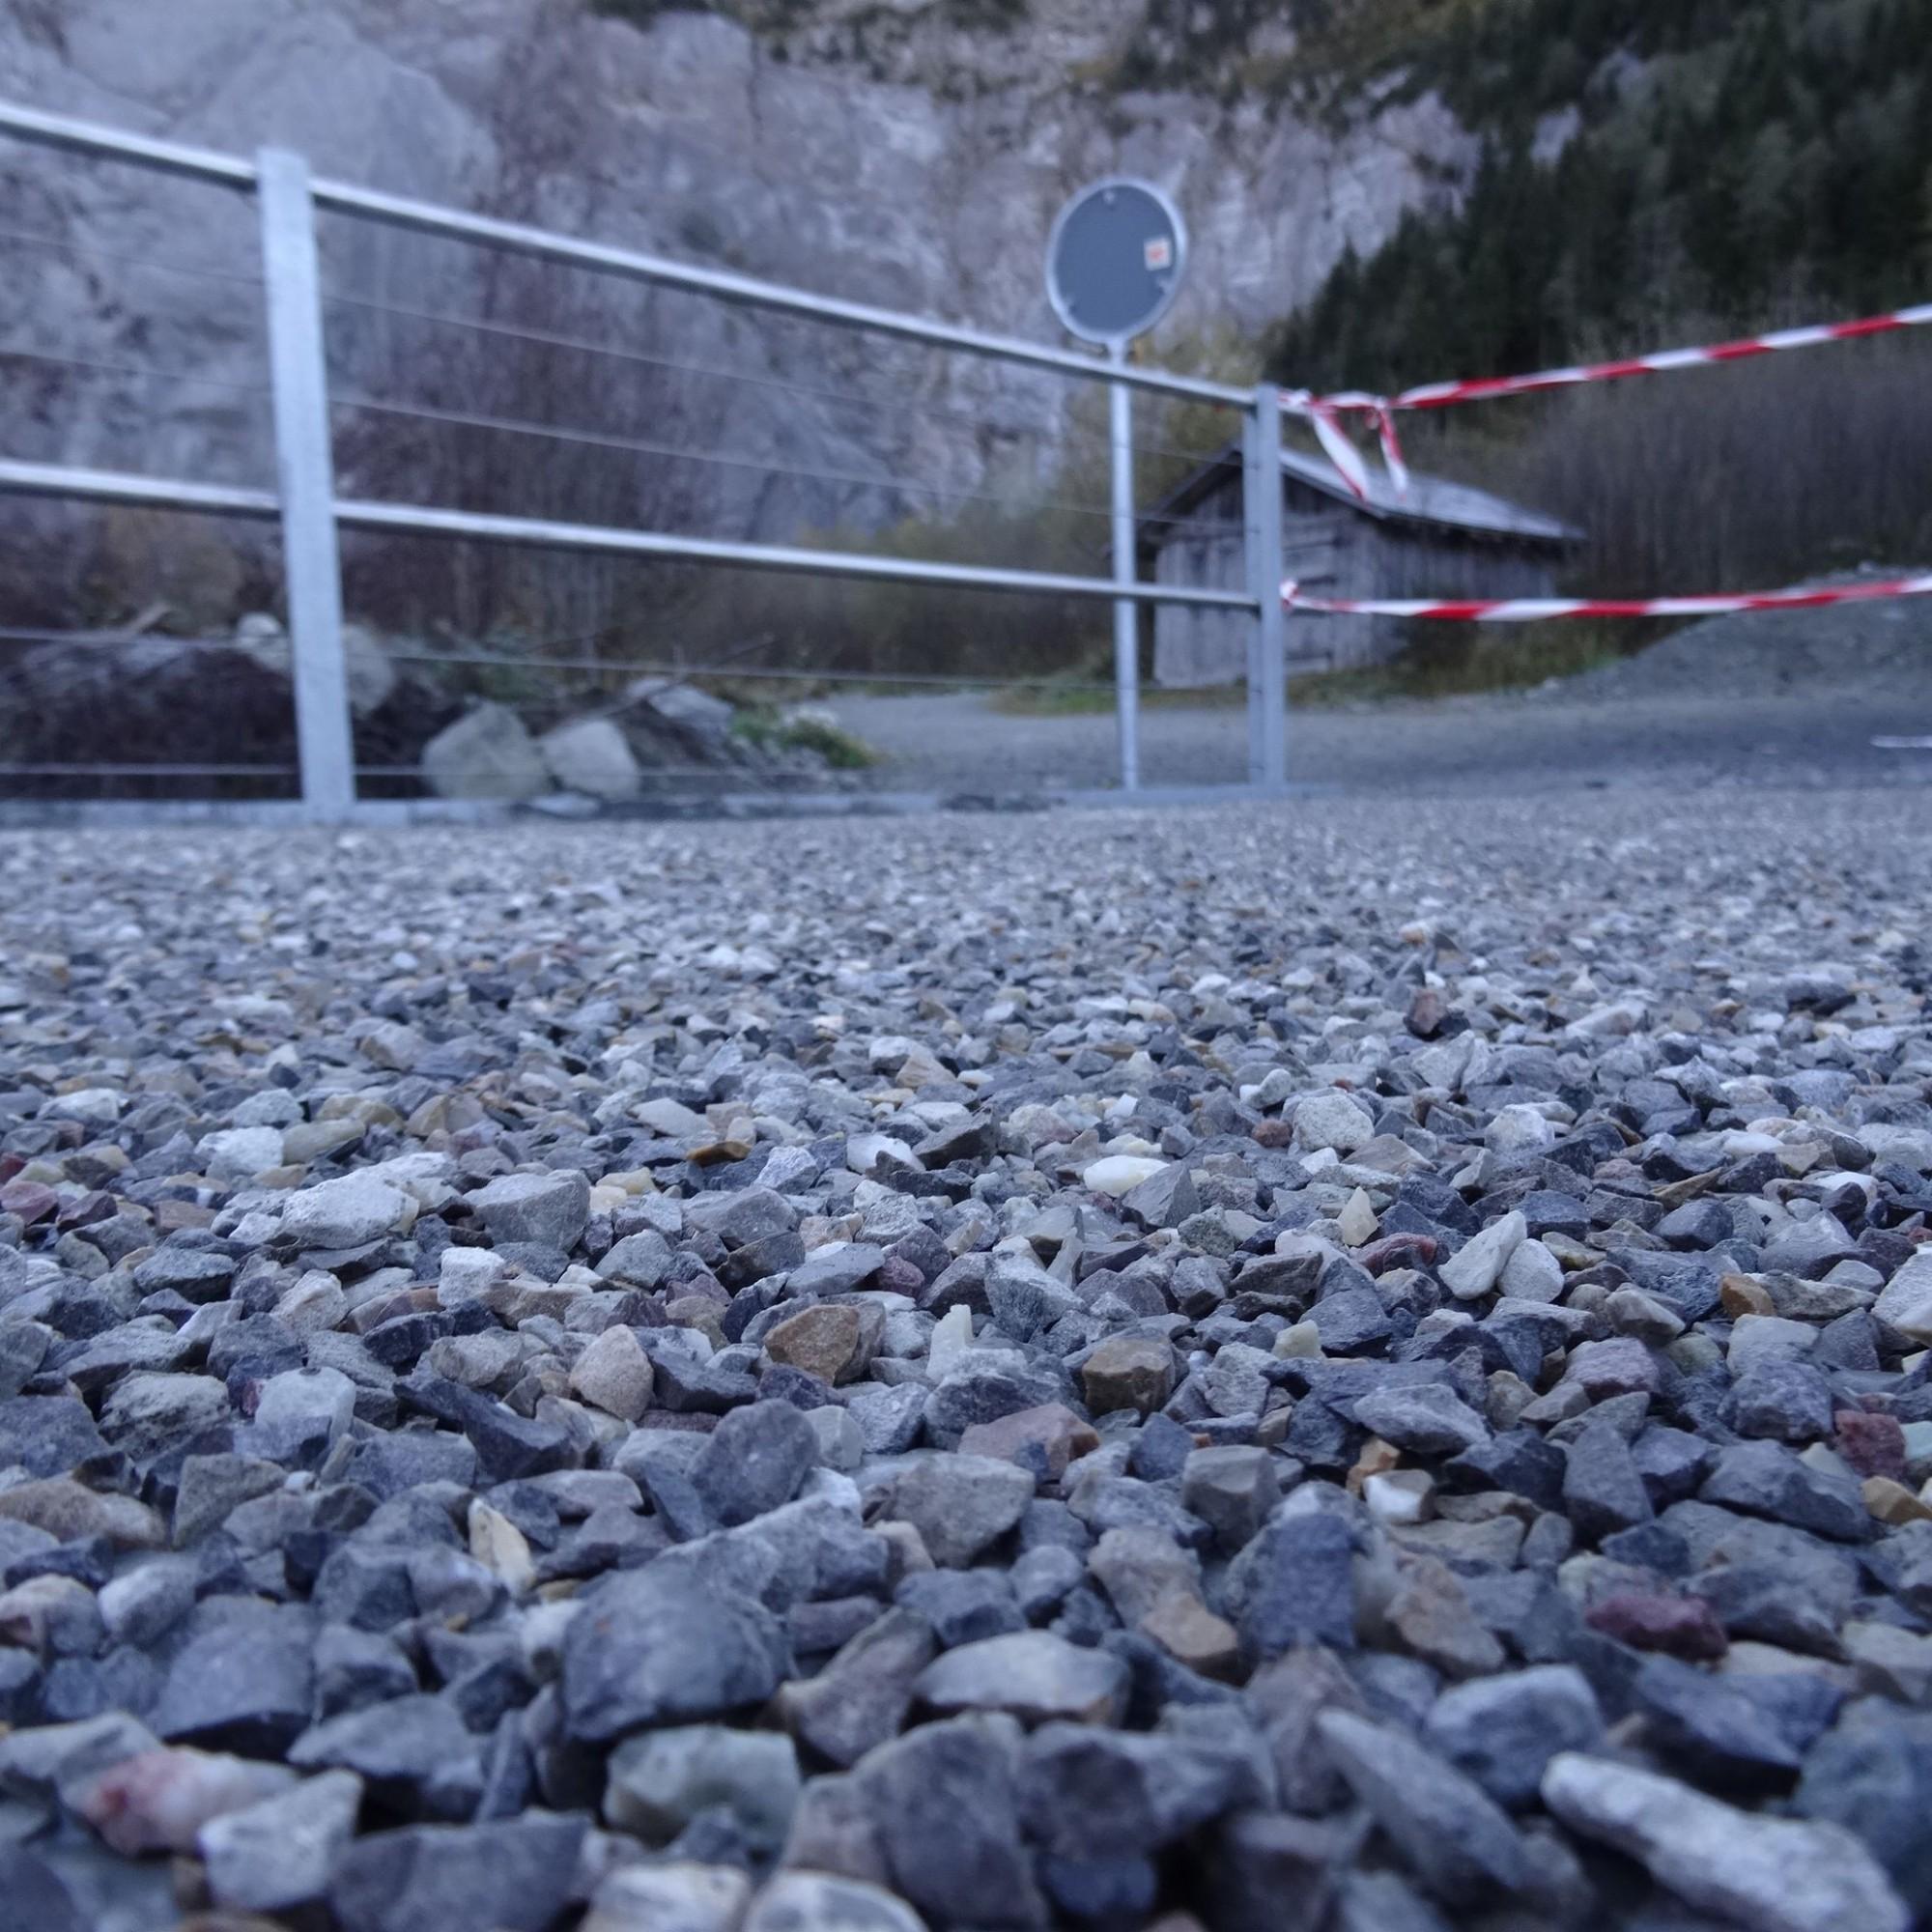 Sieger der Kategorie 5 Young Professionals: Gletschersandbrücke vonMarc-André Berchtold.